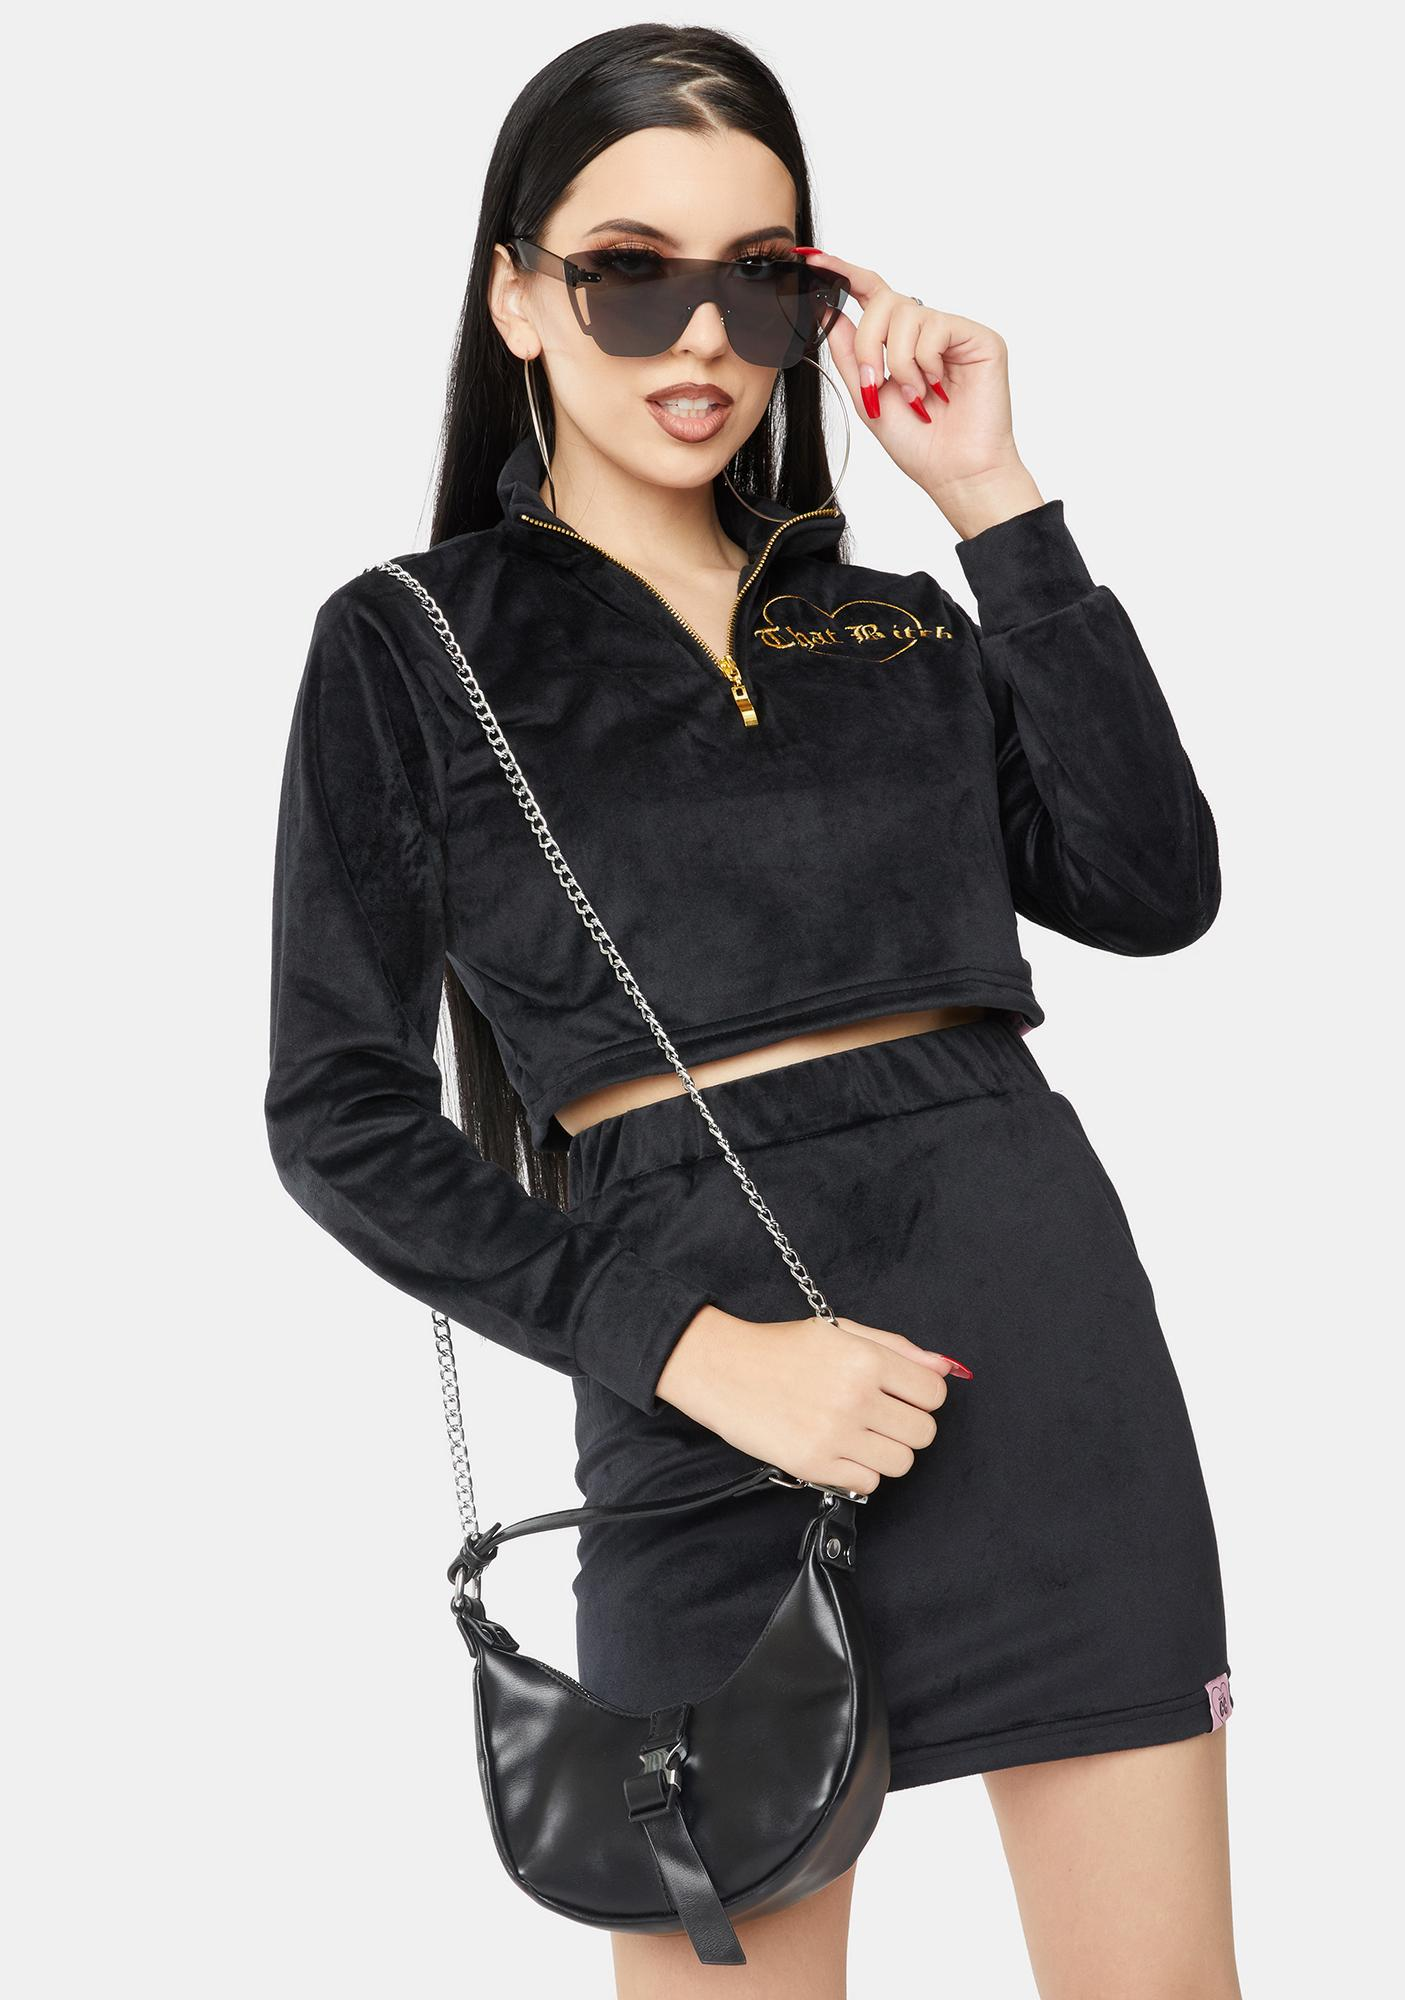 Super Lowkey Chain Handbag